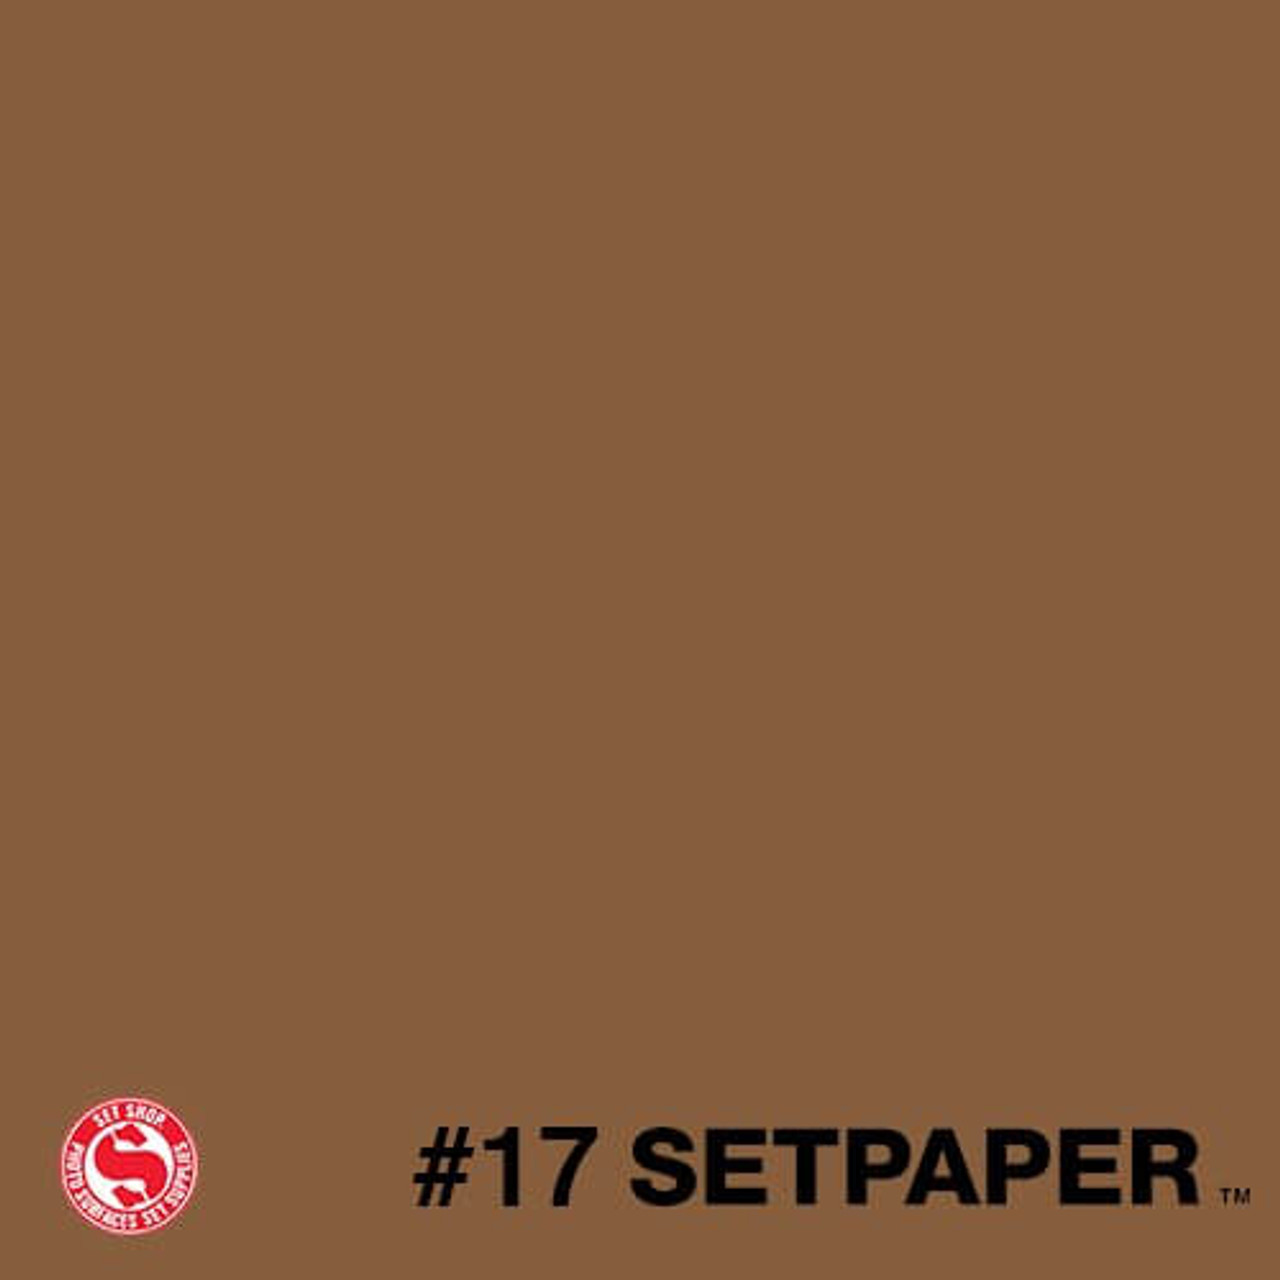 "217 SETPAPER - NUTMEG 26"" x 36' (0.66m  X 11m)"